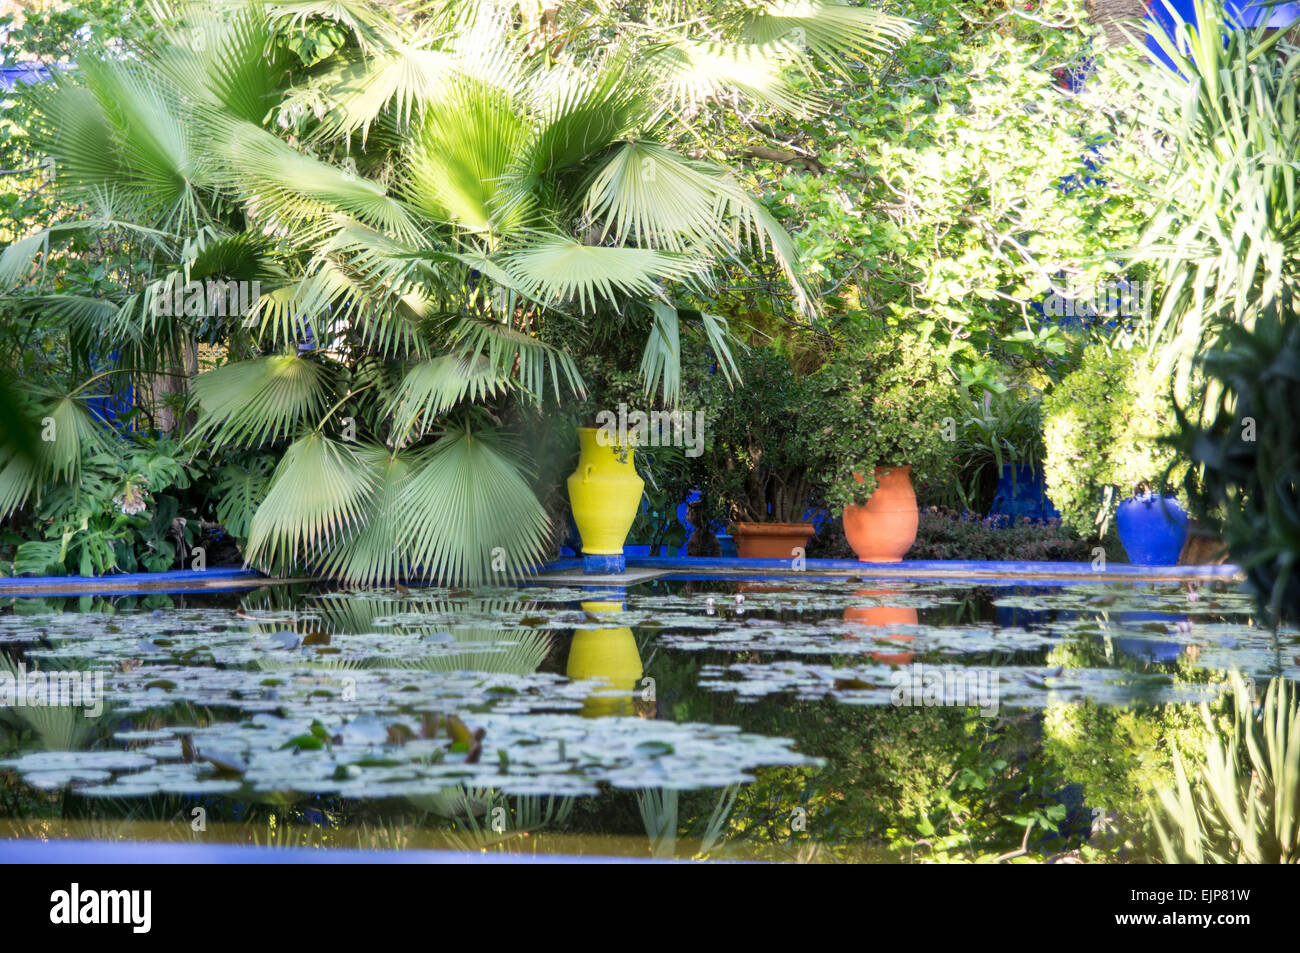 Yves Saint Laurent Memorial In The Majorelle Gardens In